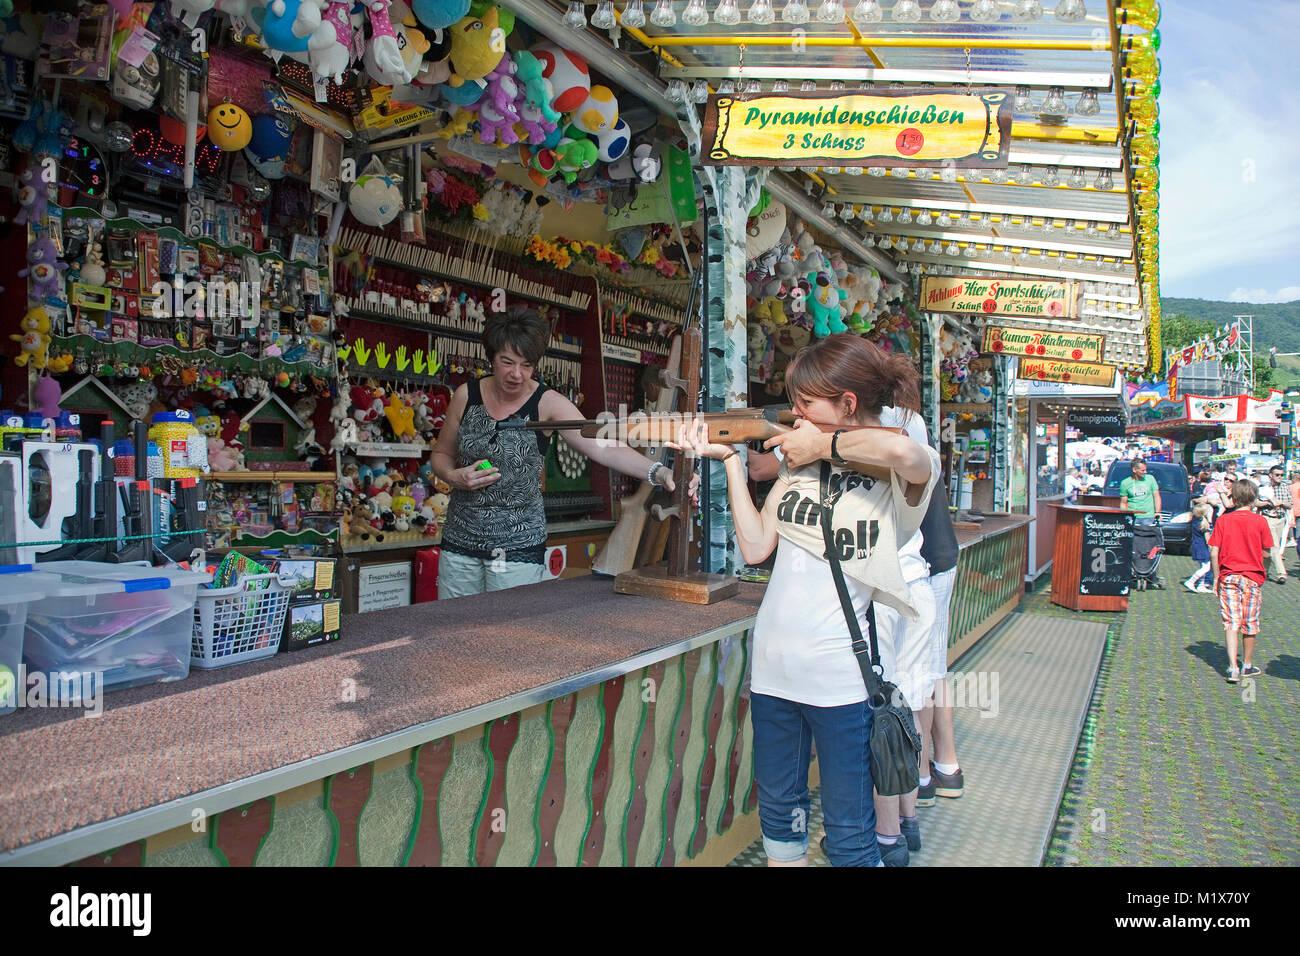 Shooting gallery at the fairground of wine village Bernkastel-Kues, Moselle river, Rhineland-Palatinate, Germany, - Stock Image